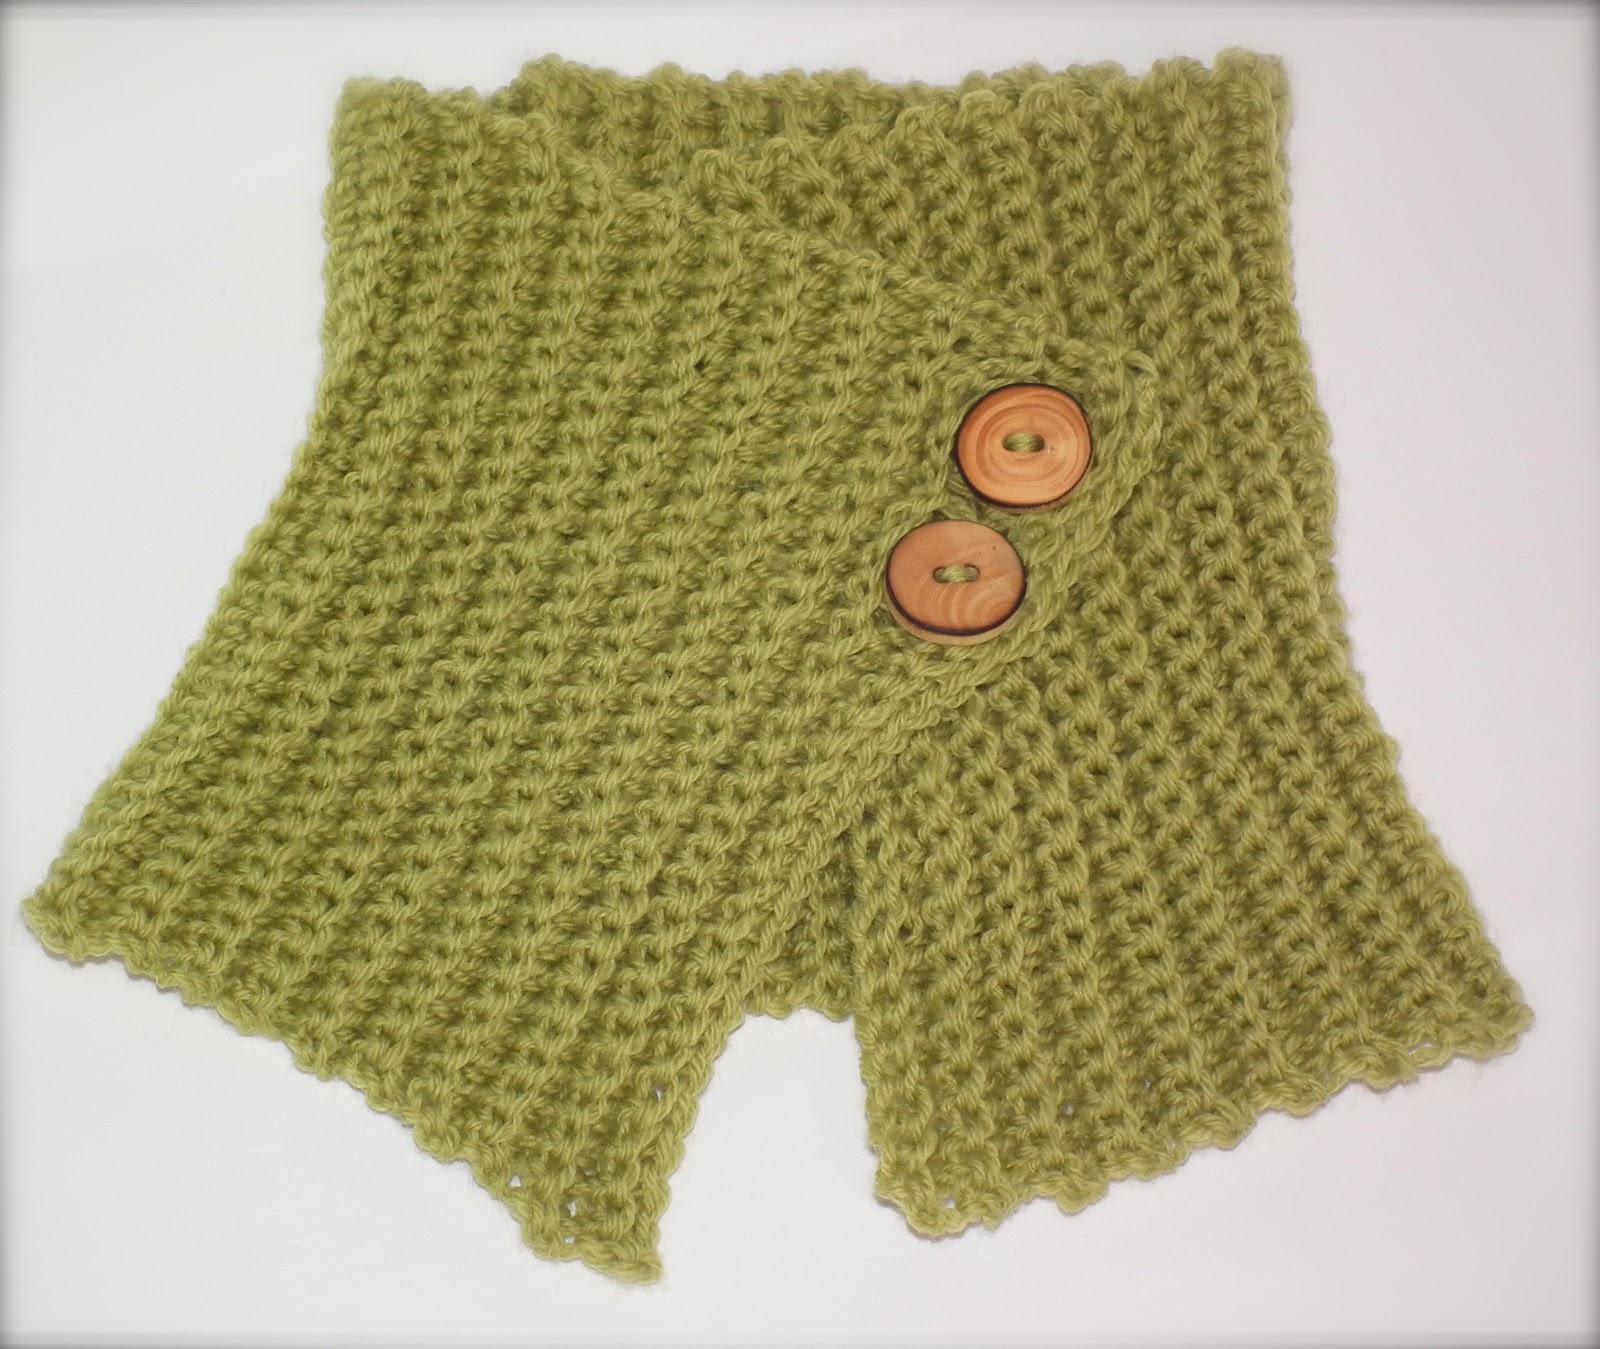 Crochet Neck Warmer Patterns  U2013 Crochet For Beginners